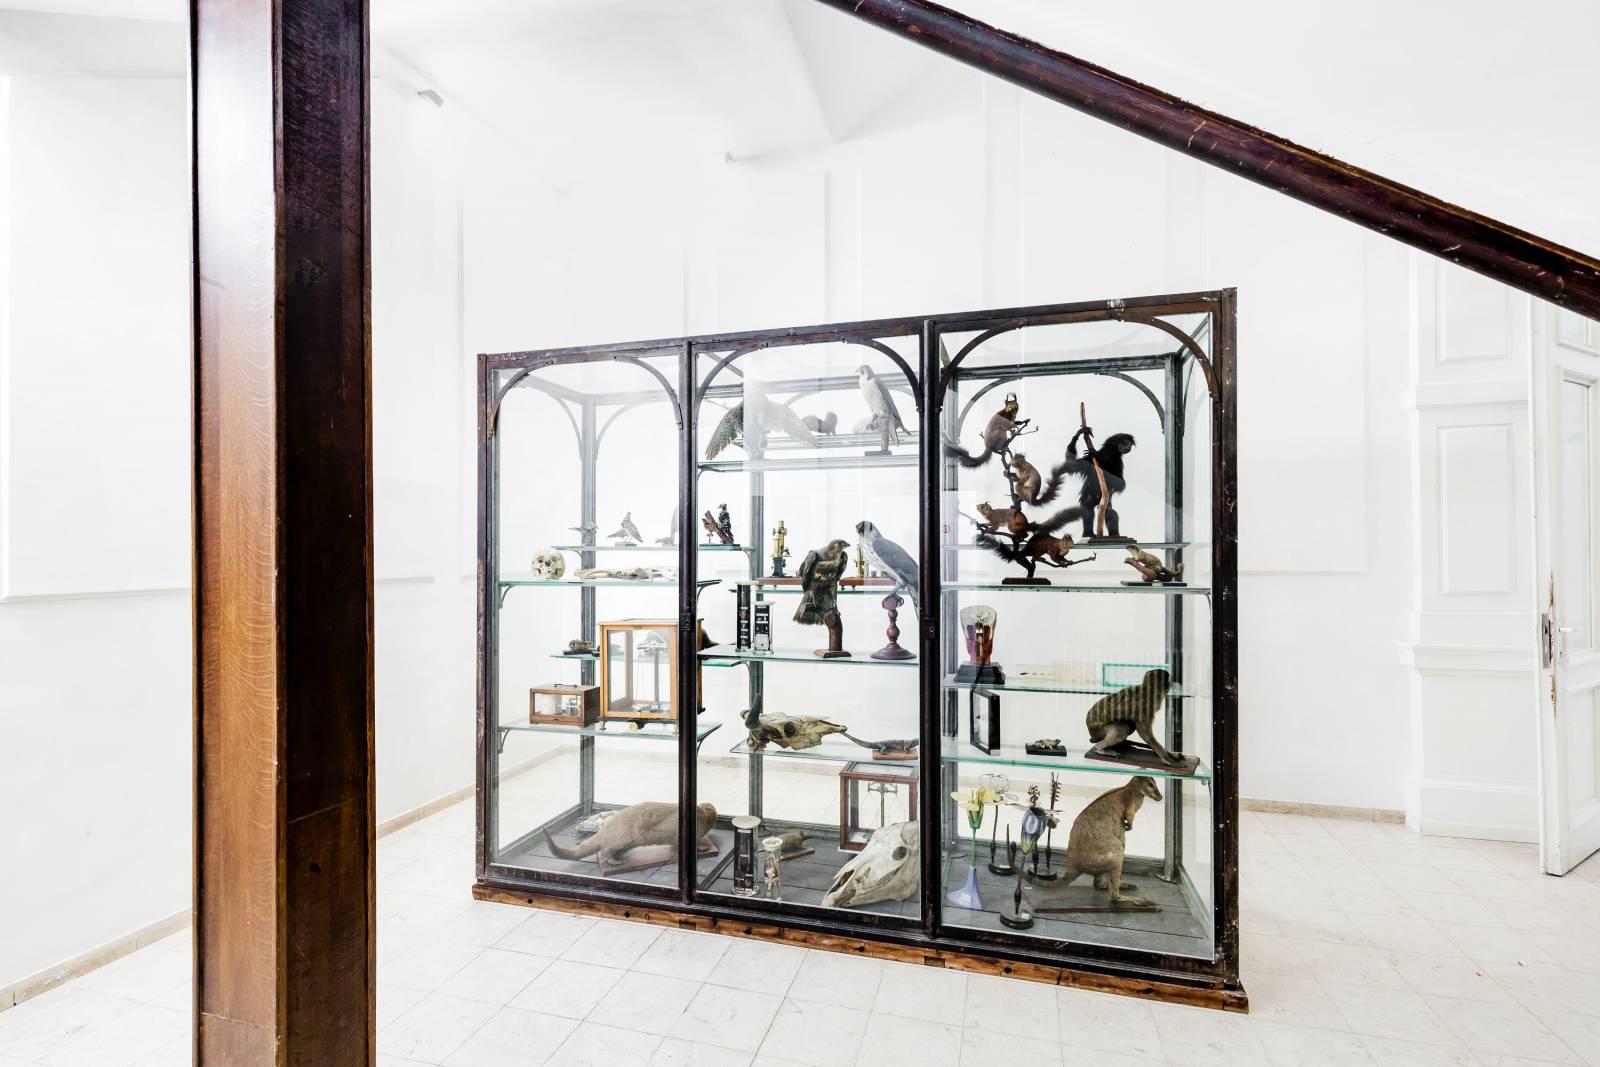 Zaal AthenA - Feestzaal - Trouwzaal - Antwerpen - House of Weddings - 4